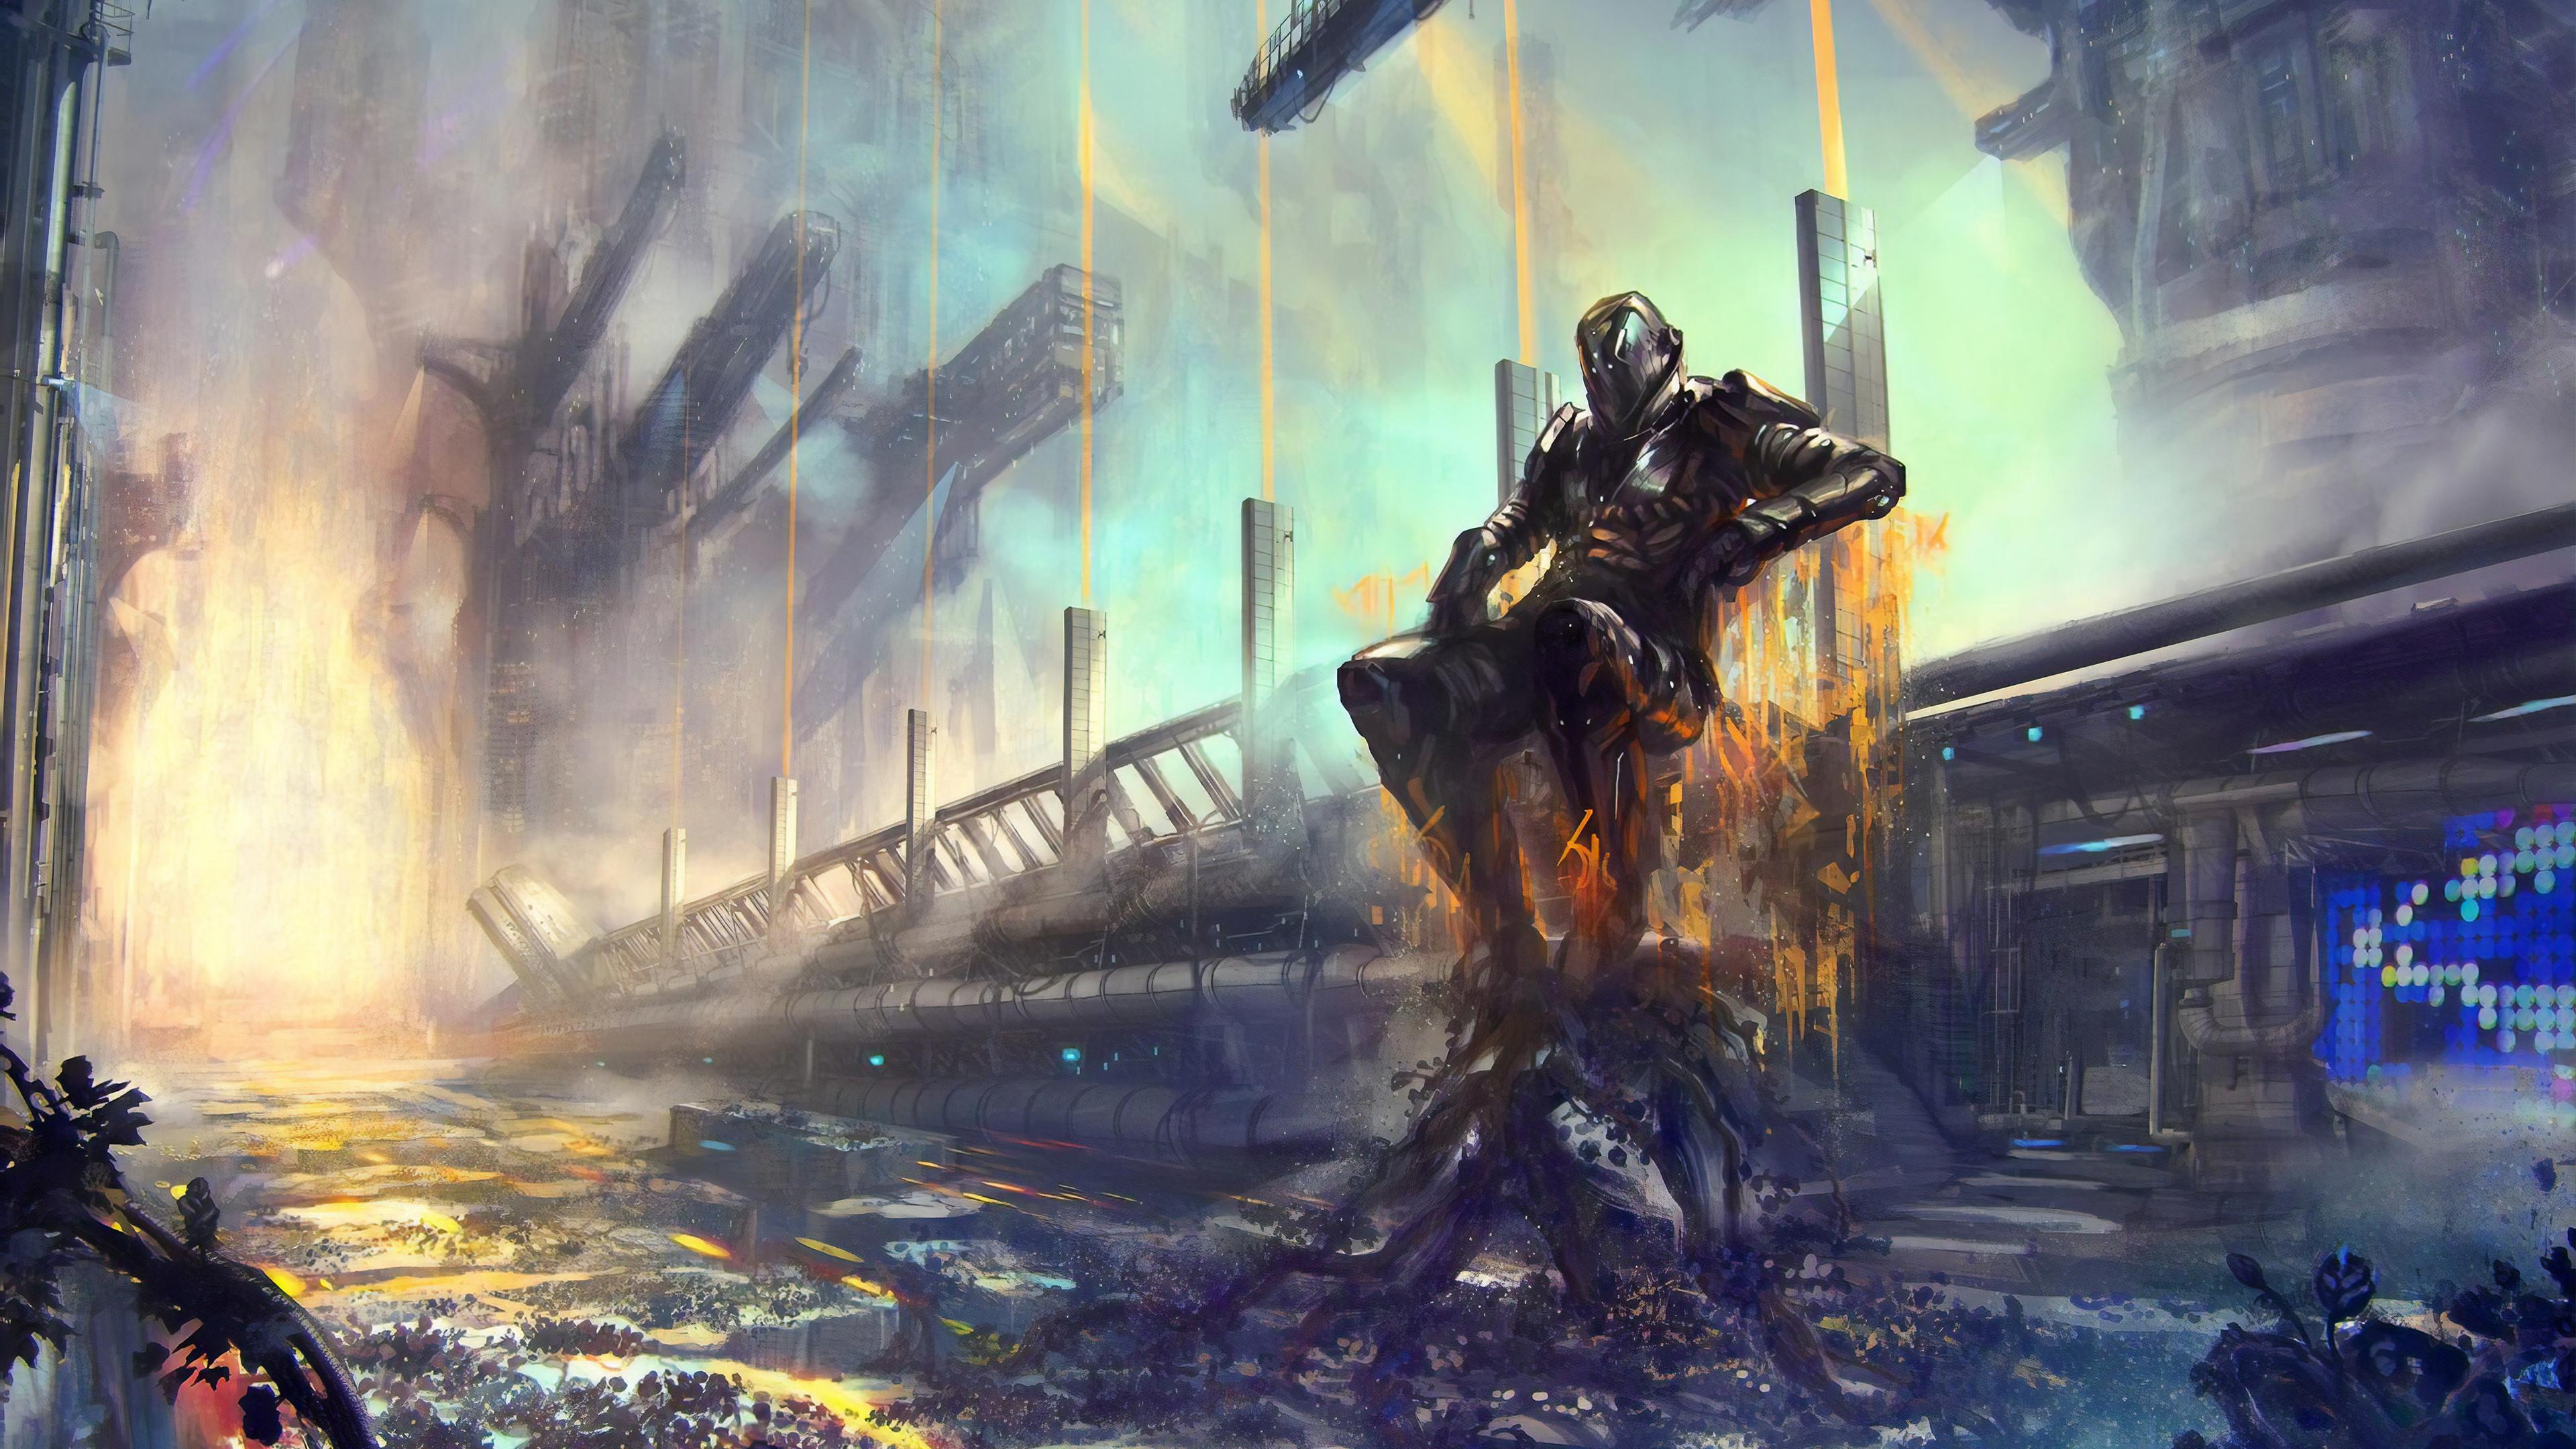 cyberpunk boss 1563222048 - Cyberpunk Boss - scifi wallpapers, hd-wallpapers, digital art wallpapers, deviantart wallpapers, cyberpunk wallpapers, artwork wallpapers, artist wallpapers, 4k-wallpapers